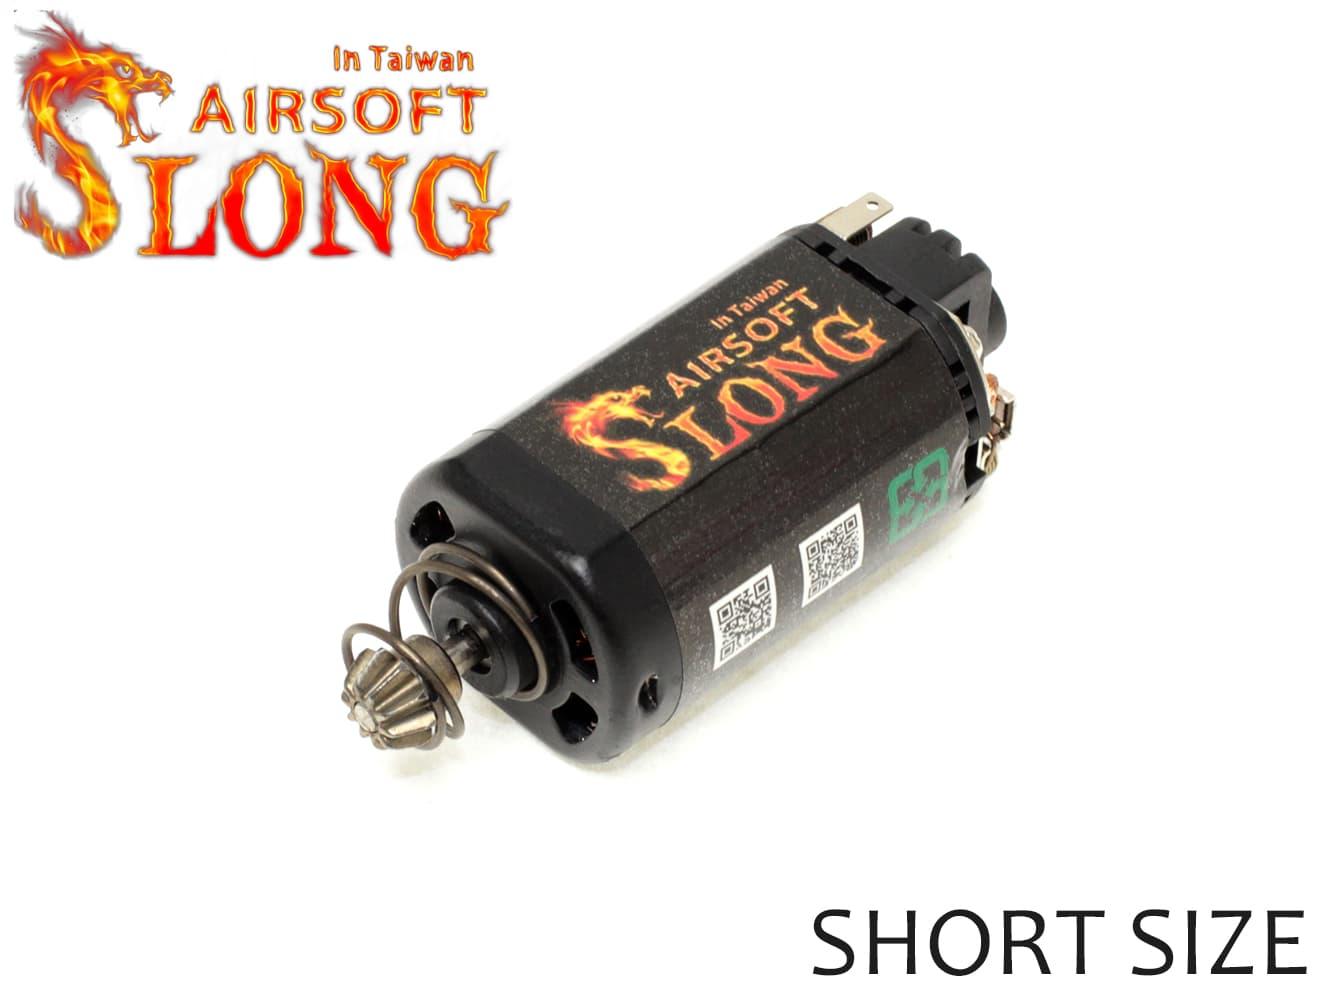 SLONG AIRSOFT DO NOT STOP モーター ショート◆電動ガン ショートサイズモーター機種対応 超強力ネオジム磁石使用 ハイスピード & ハイトルク